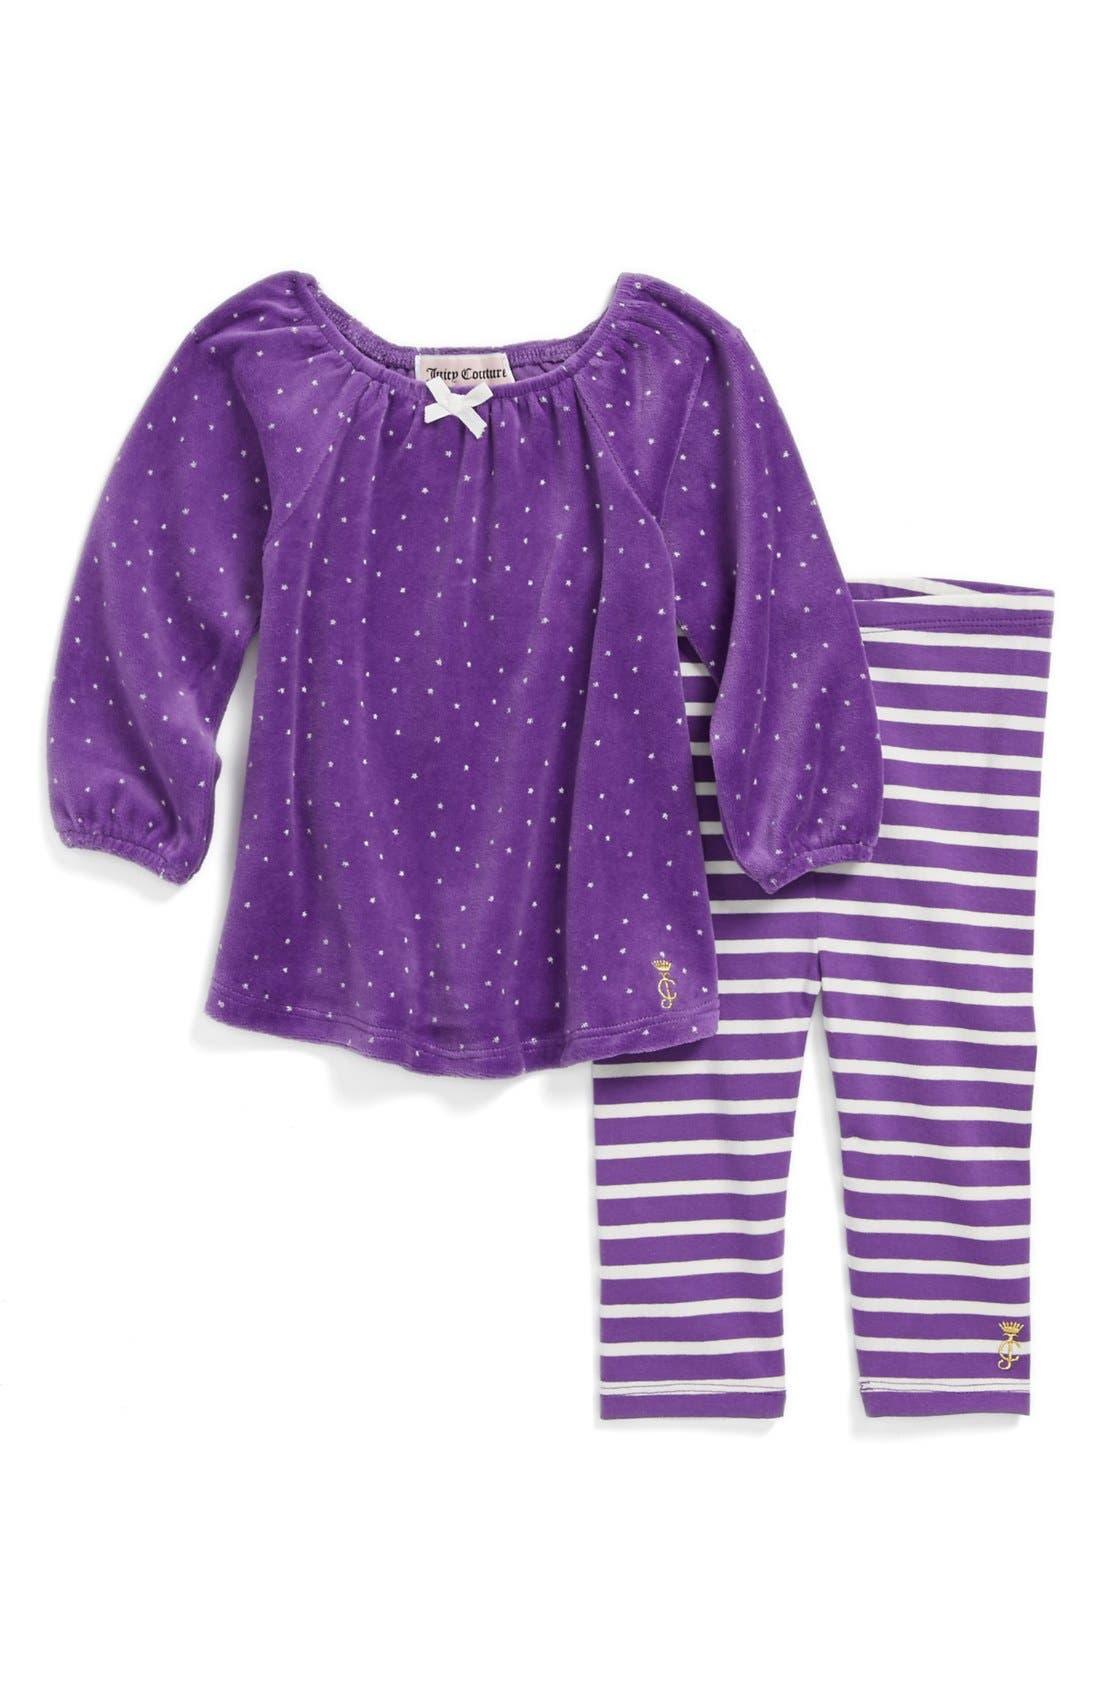 Alternate Image 1 Selected - Juicy Couture Top & Leggings (Baby Girls)